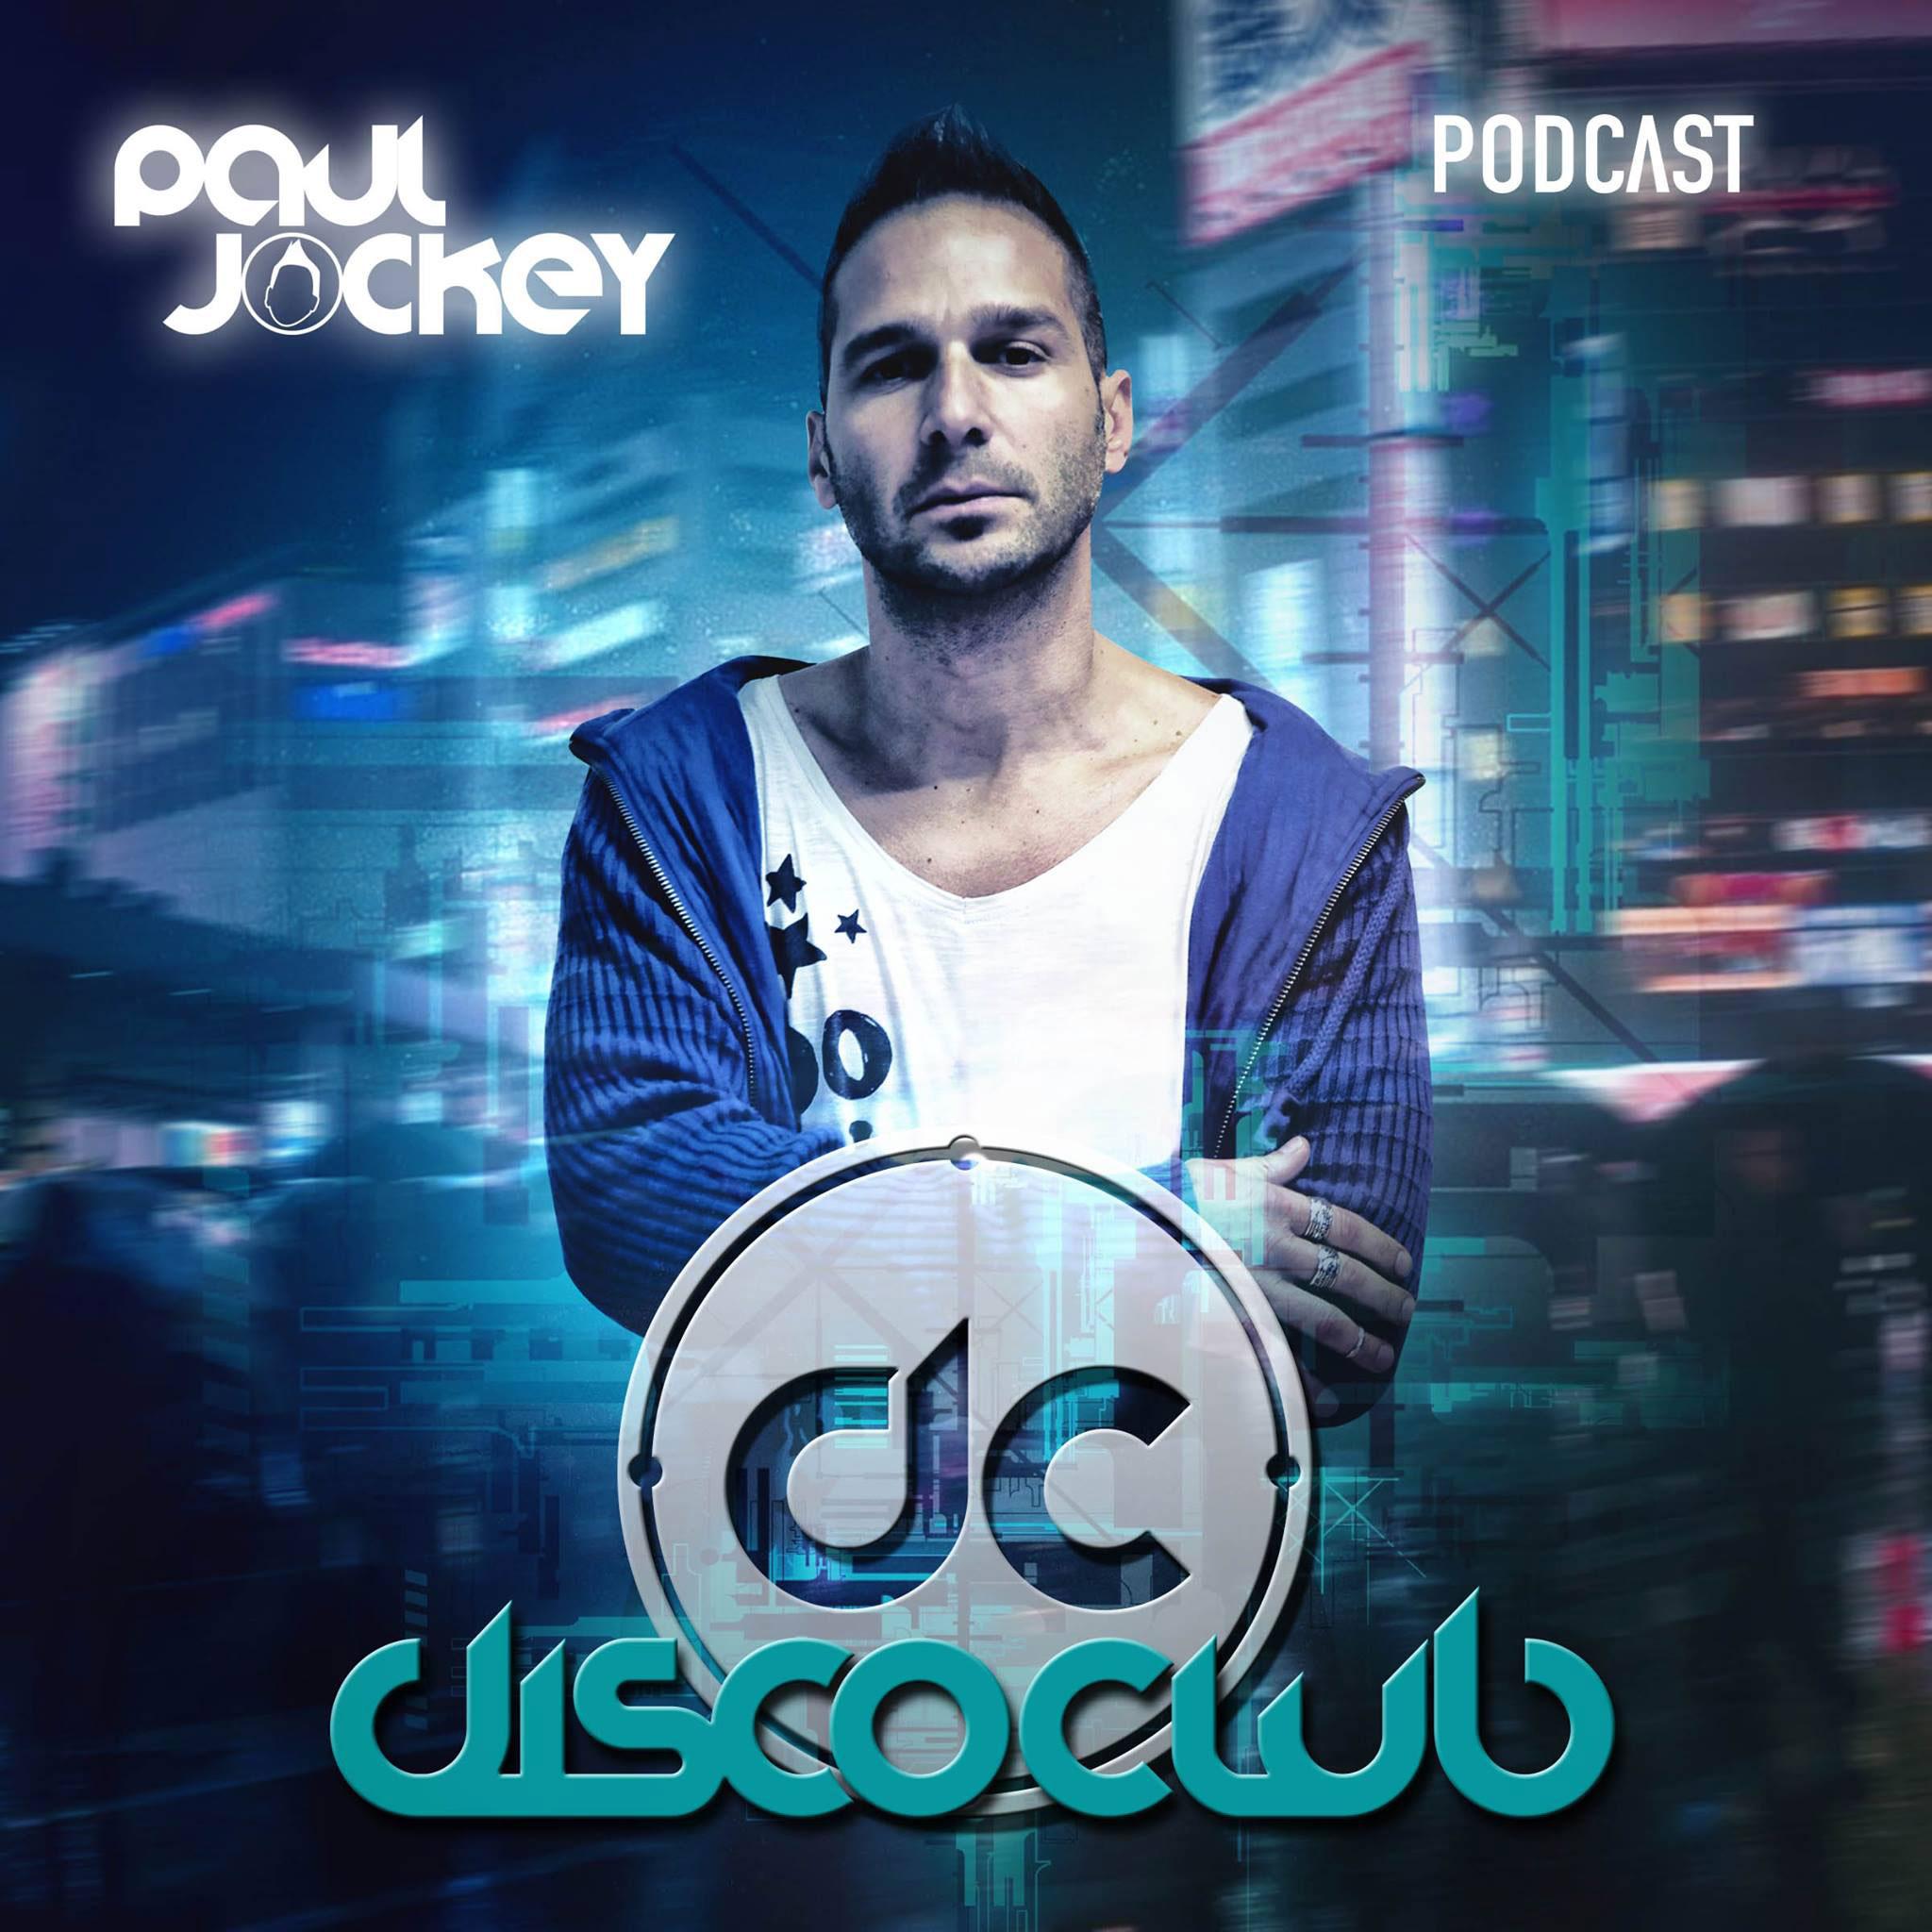 Disco Club -  Paul Jockey Official Podcast